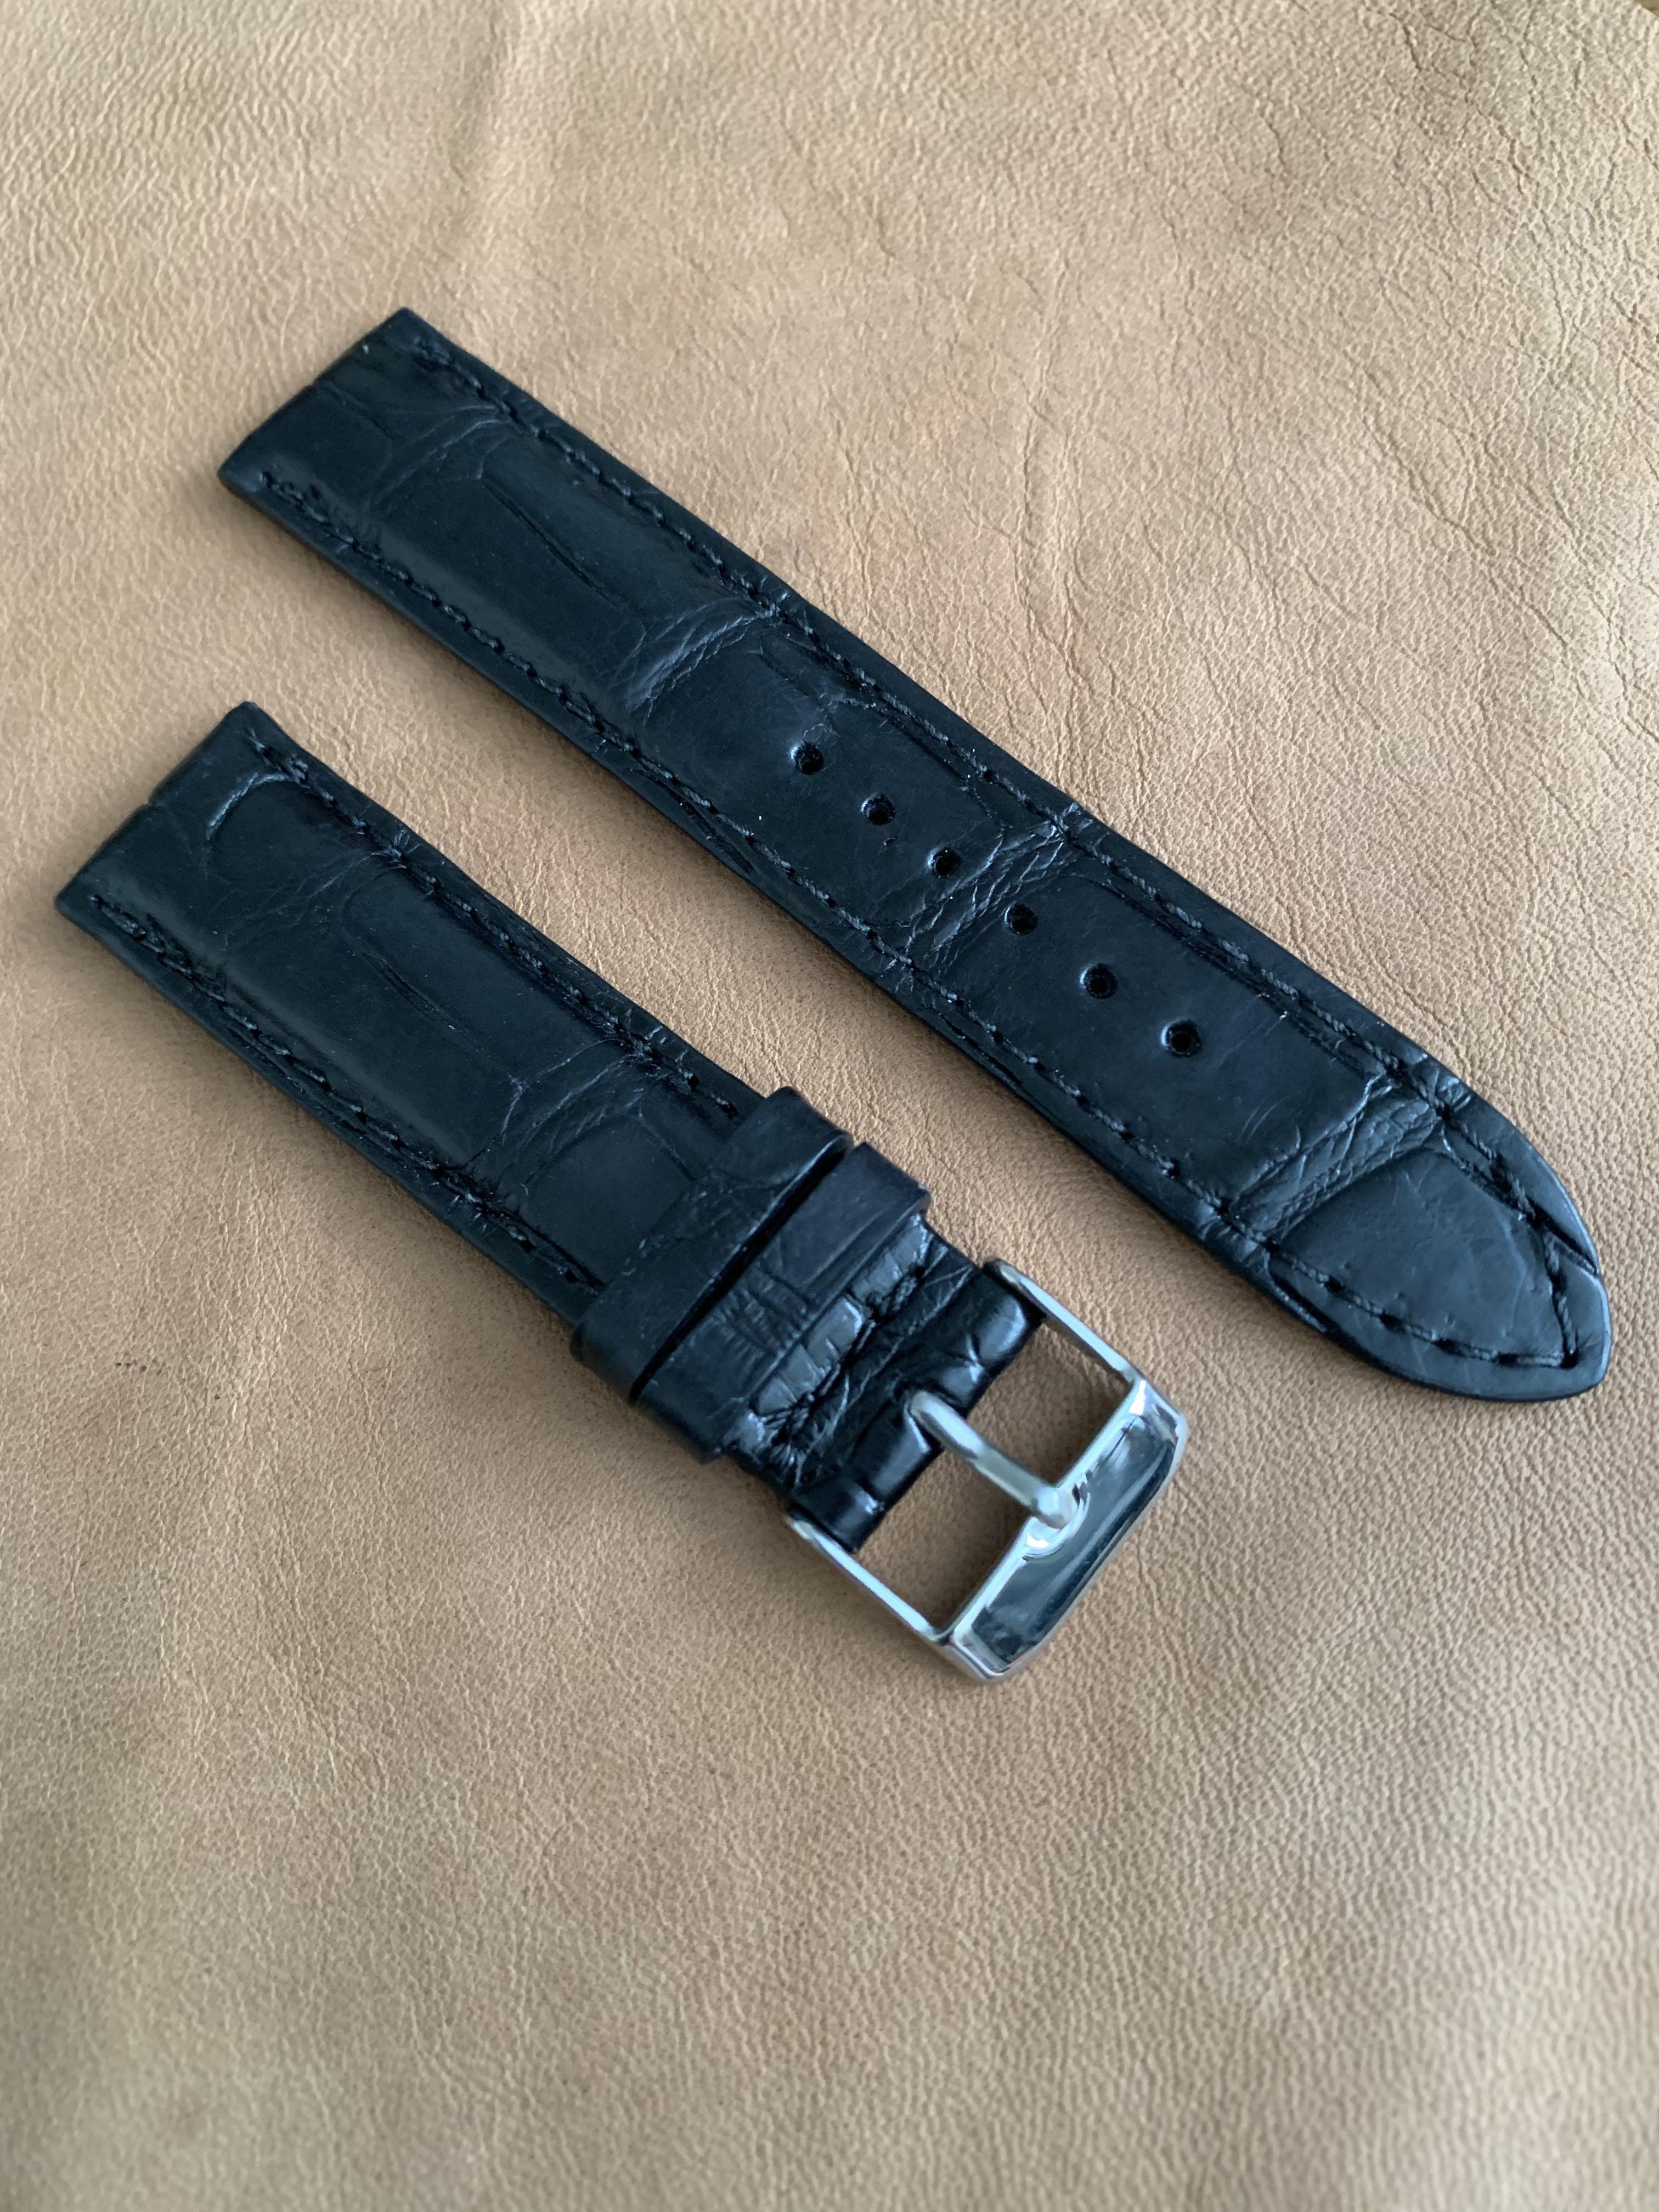 Black Crocodile Alligator Watch Strap (smooth croc belly) 20mm@lug/18mm@buckle #MRTHougang #MRTSerangoon #MRTSengkang #MRTPunggol #MRTRaffles #MRTBedok #MRTTampines #MRTCCK #MRTJurongEast #MRTYishun